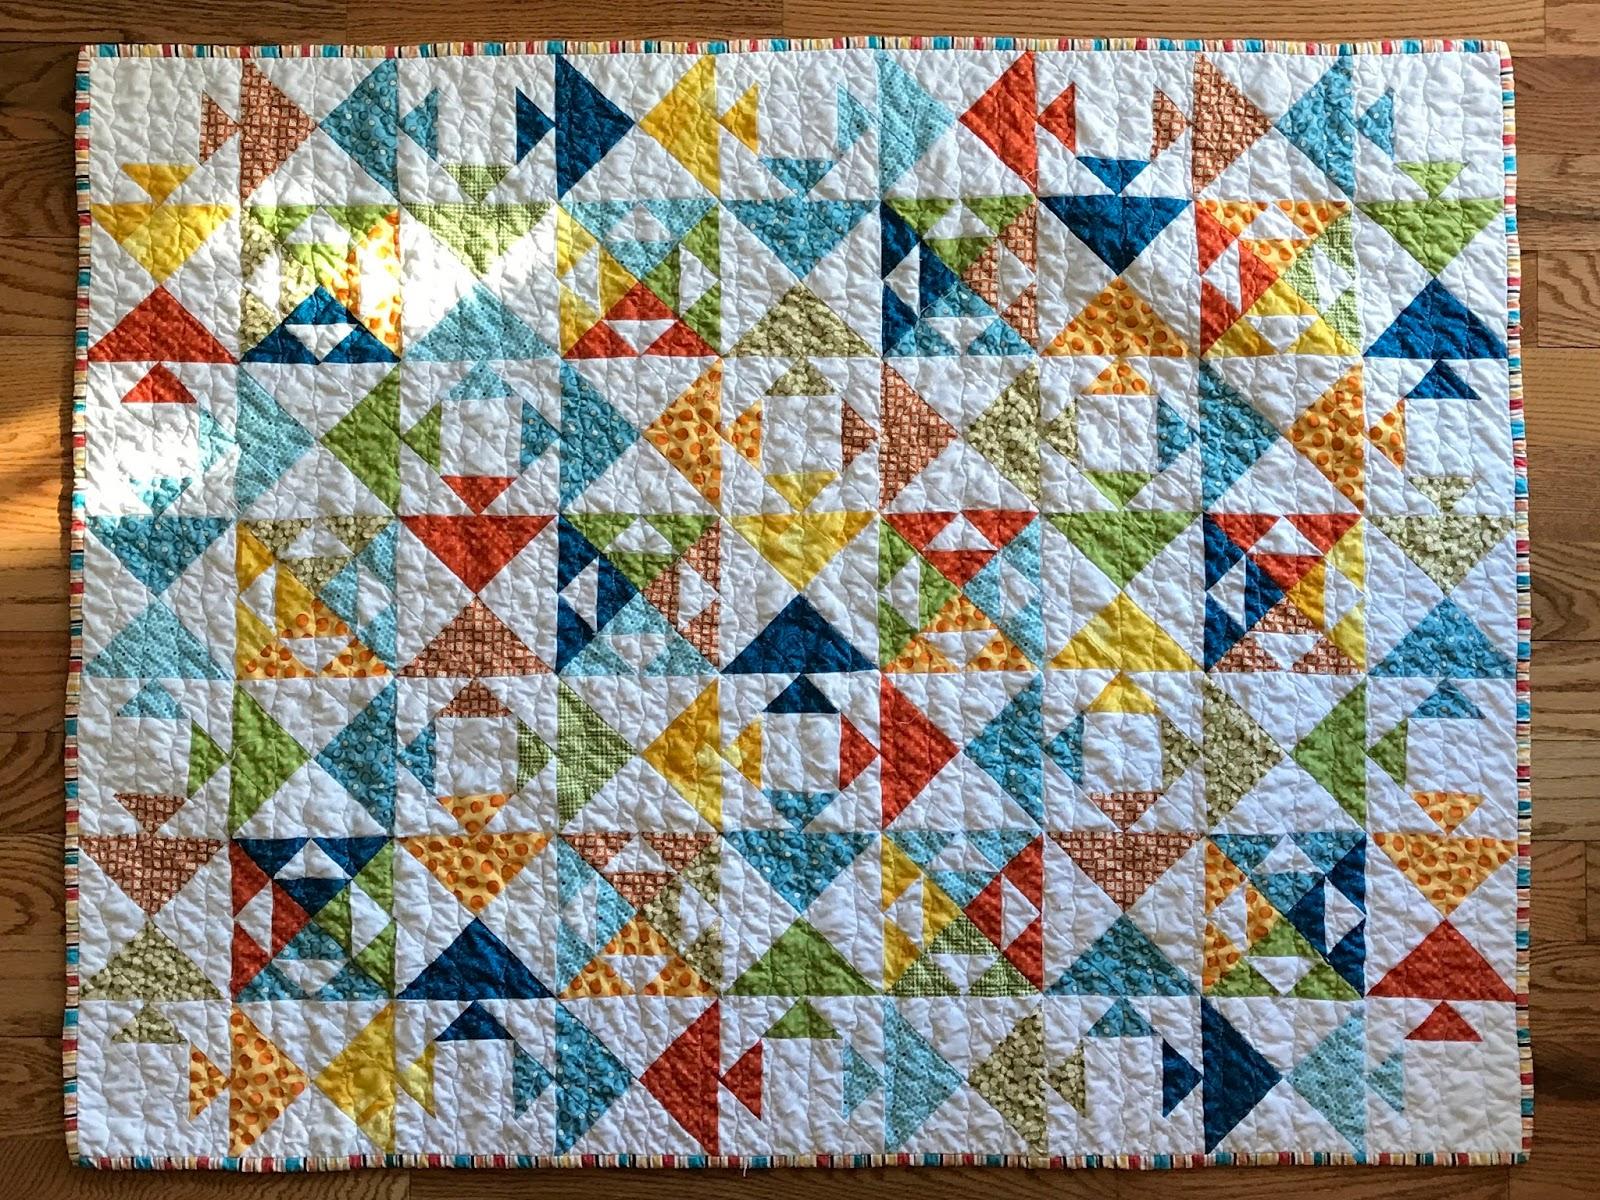 art fiber fish collage web quilt crop blue for